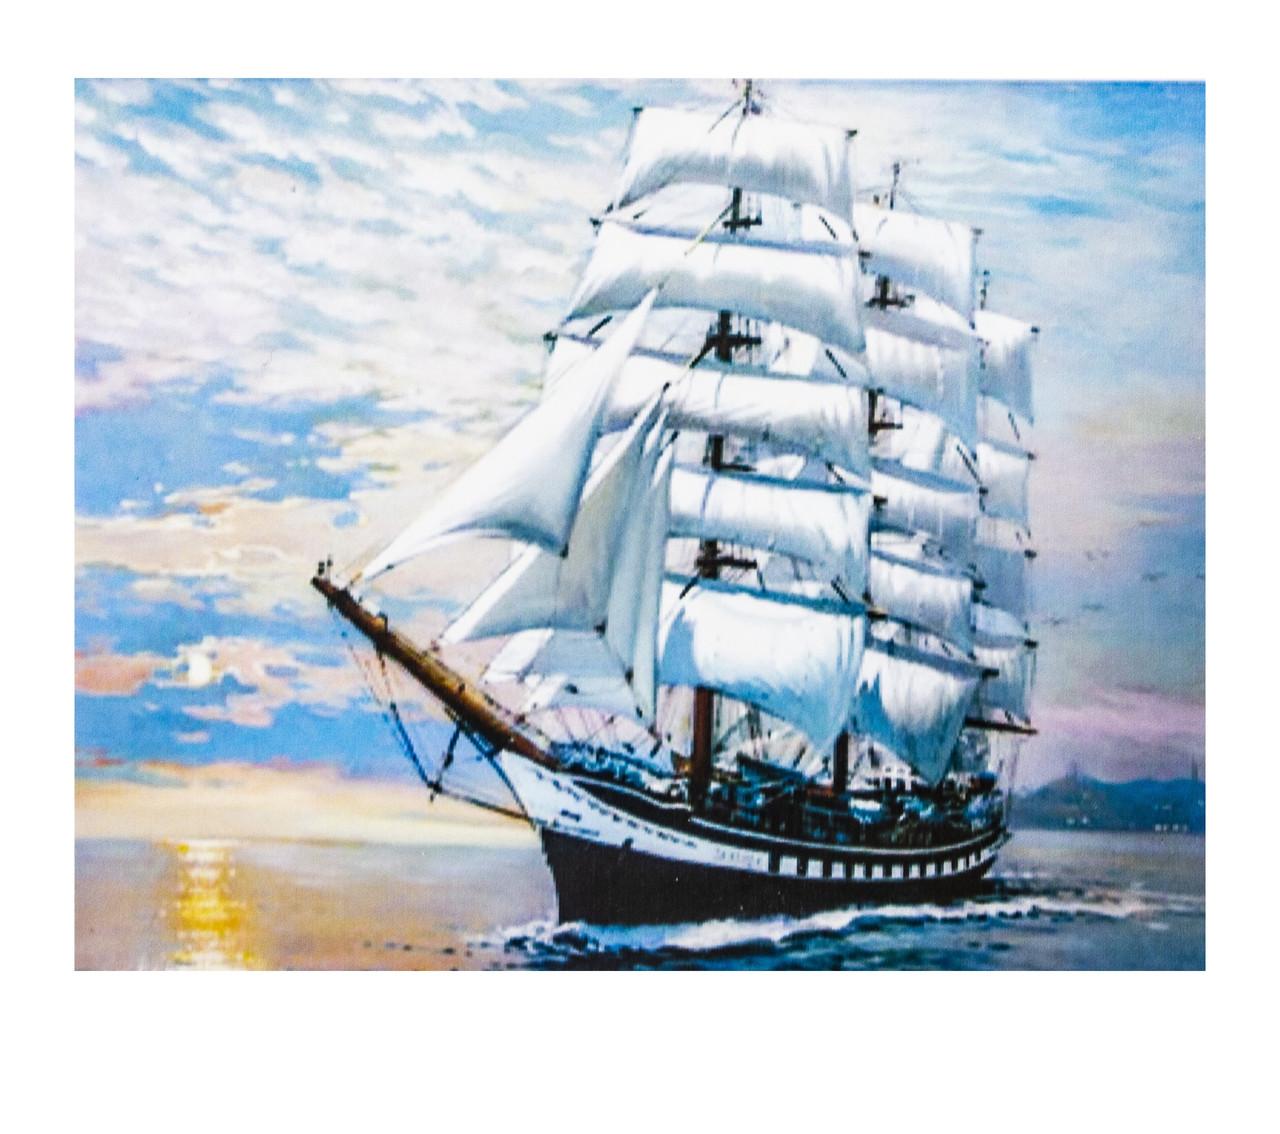 Картина по номерам Корабль, размер 40х50